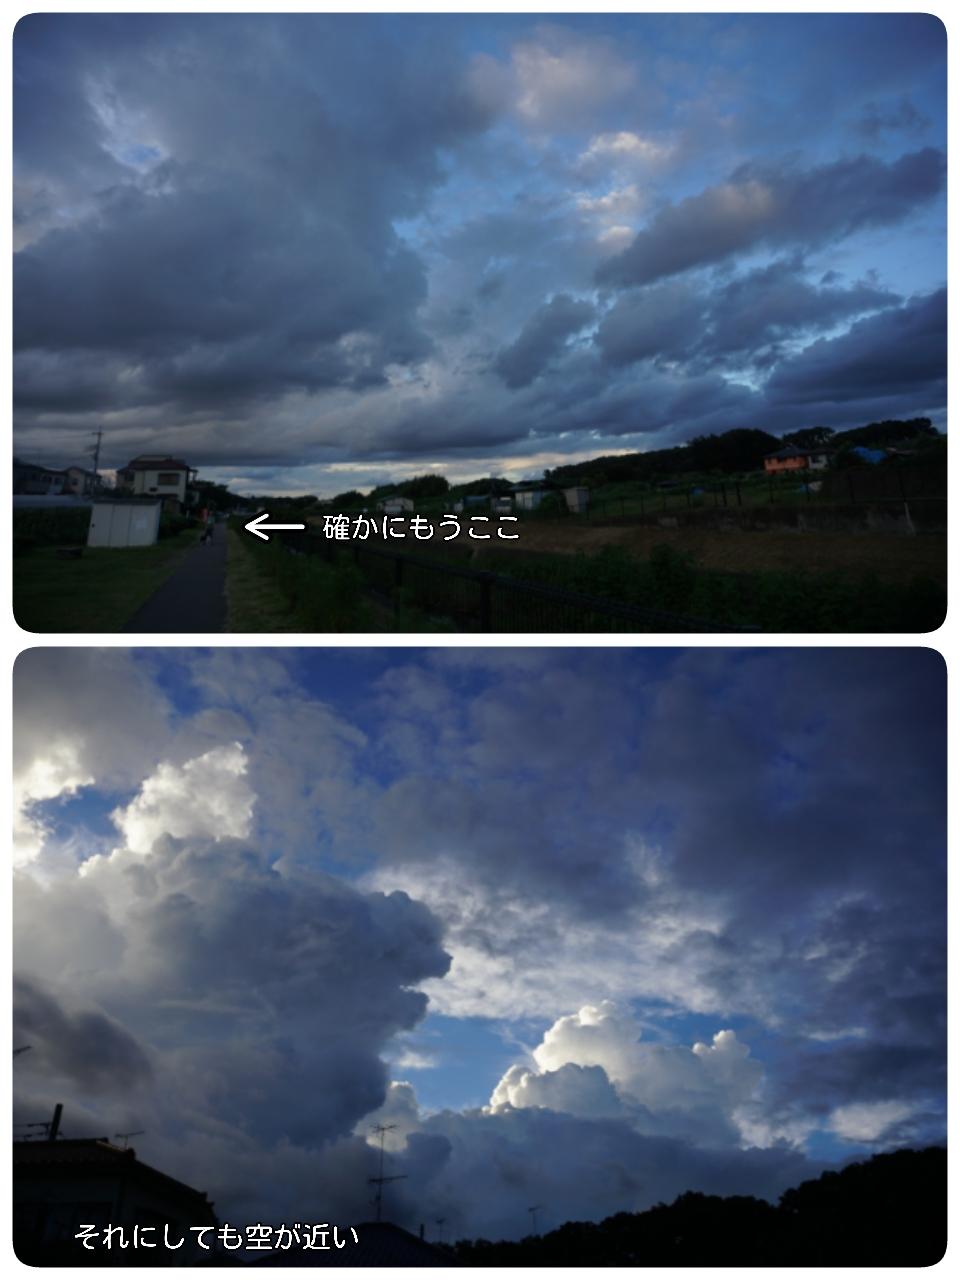 16-08-03-04-58-13-453_deco.jpg